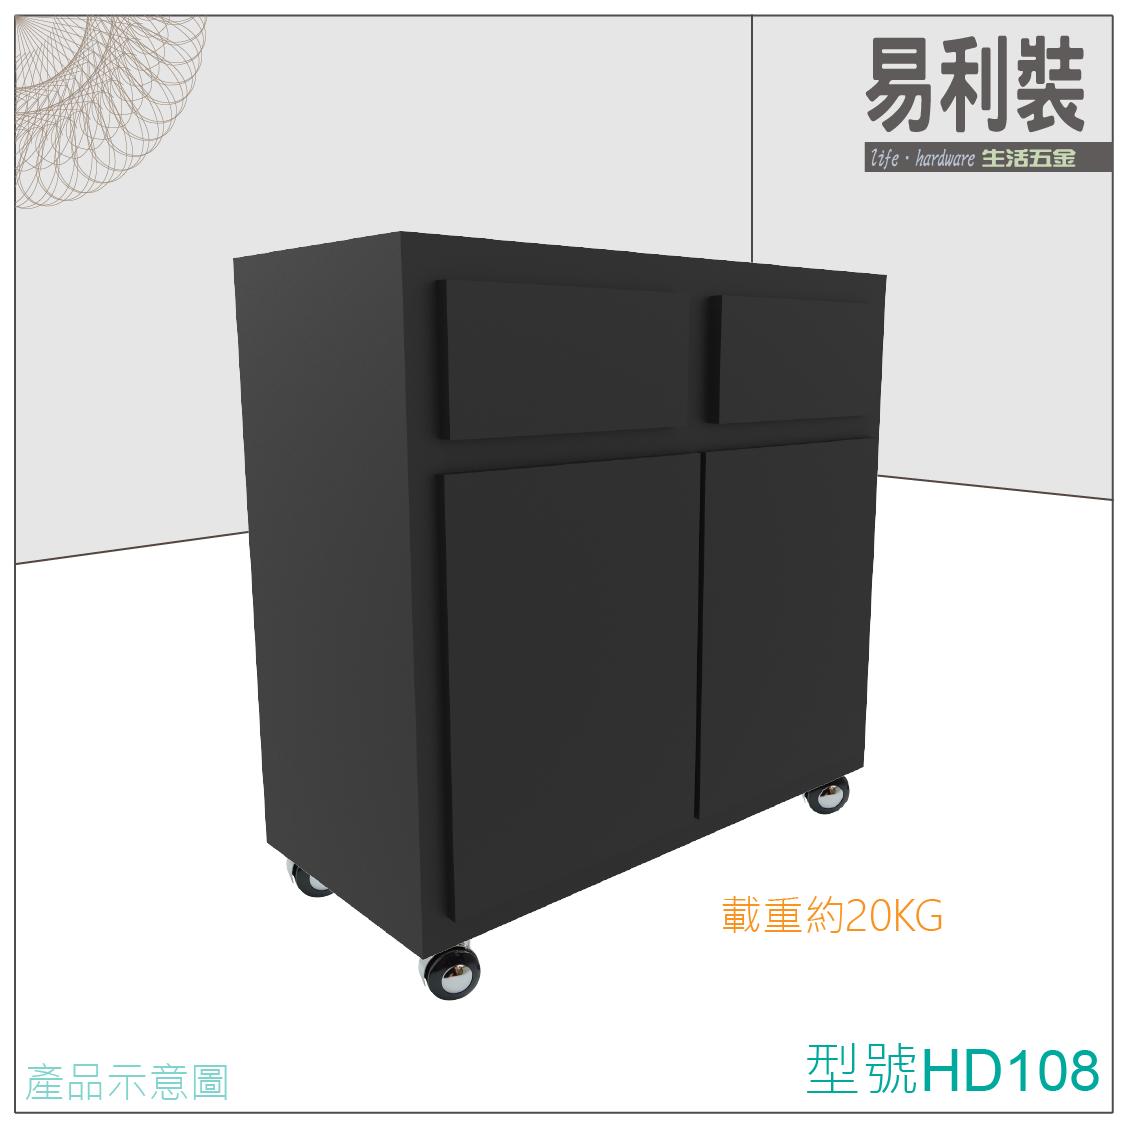 【 EASYCAN  】HD108-109 活動輪 易利裝生活五金 桌輪 櫃輪 房間 臥房 衣櫃 小資族 辦公家具 系統家具 3